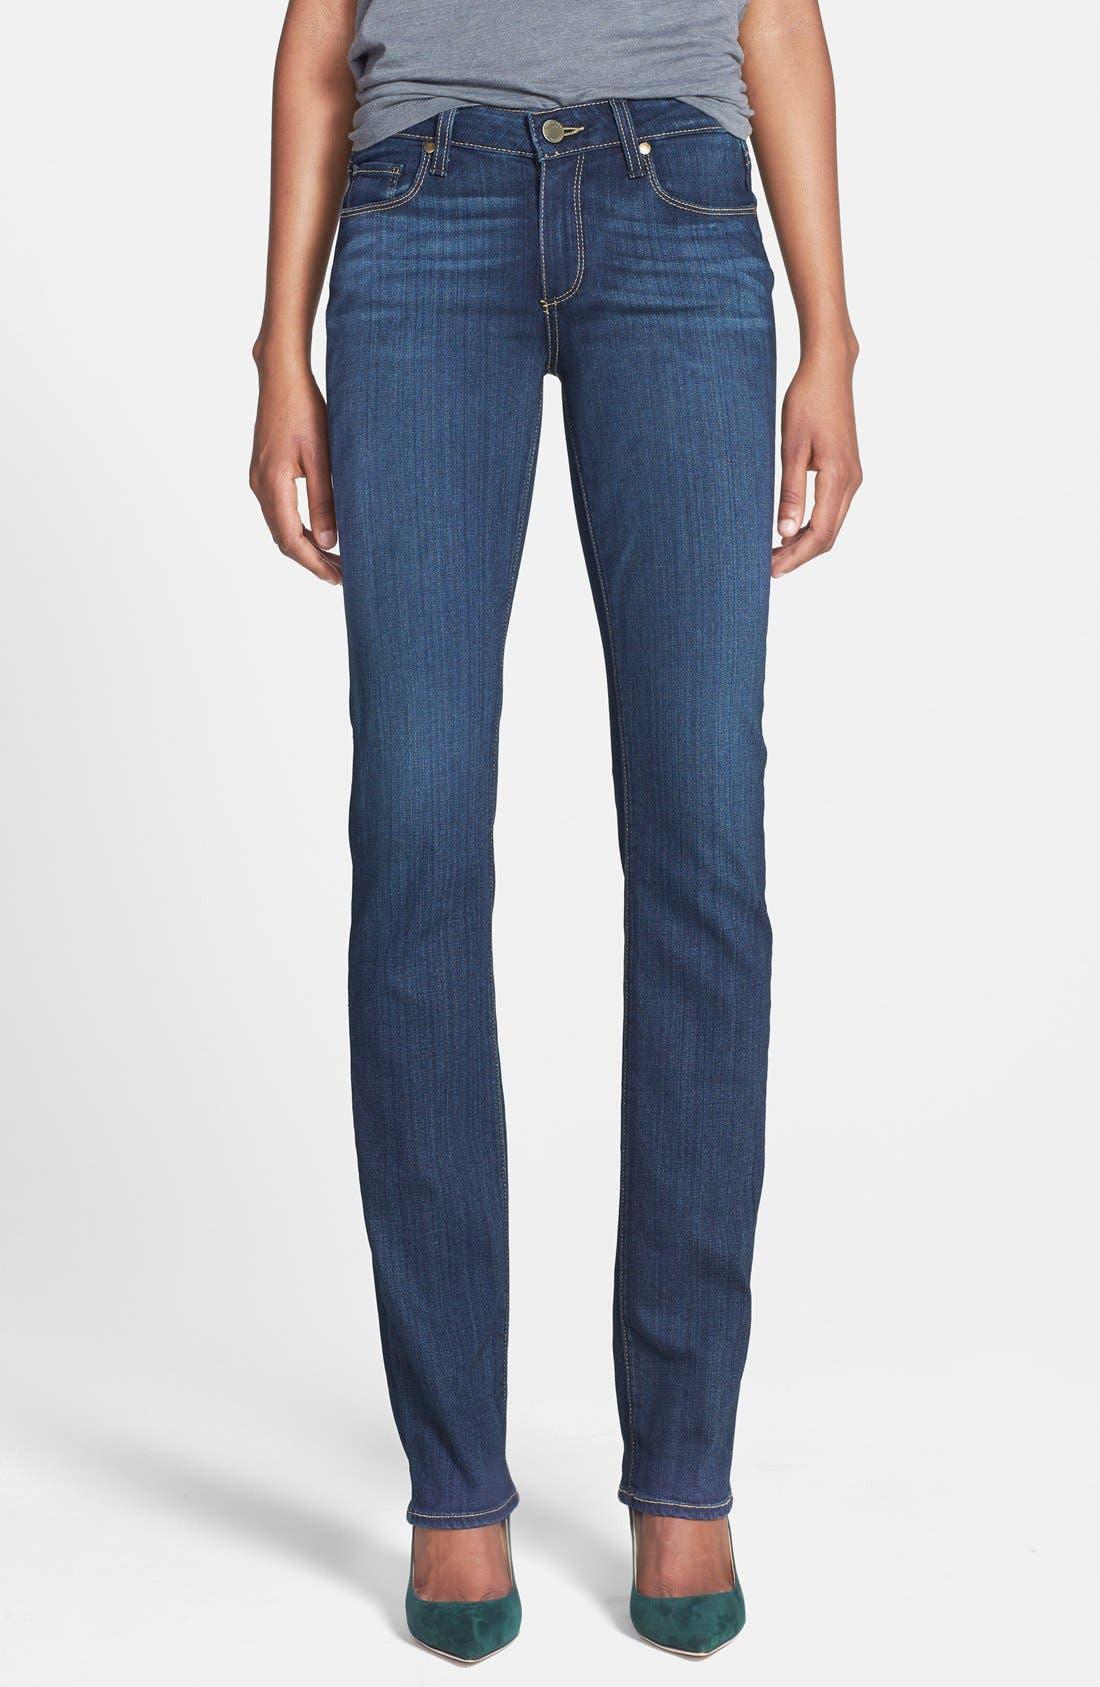 Transcend - Skyline Straight Leg Jeans,                         Main,                         color, Vista